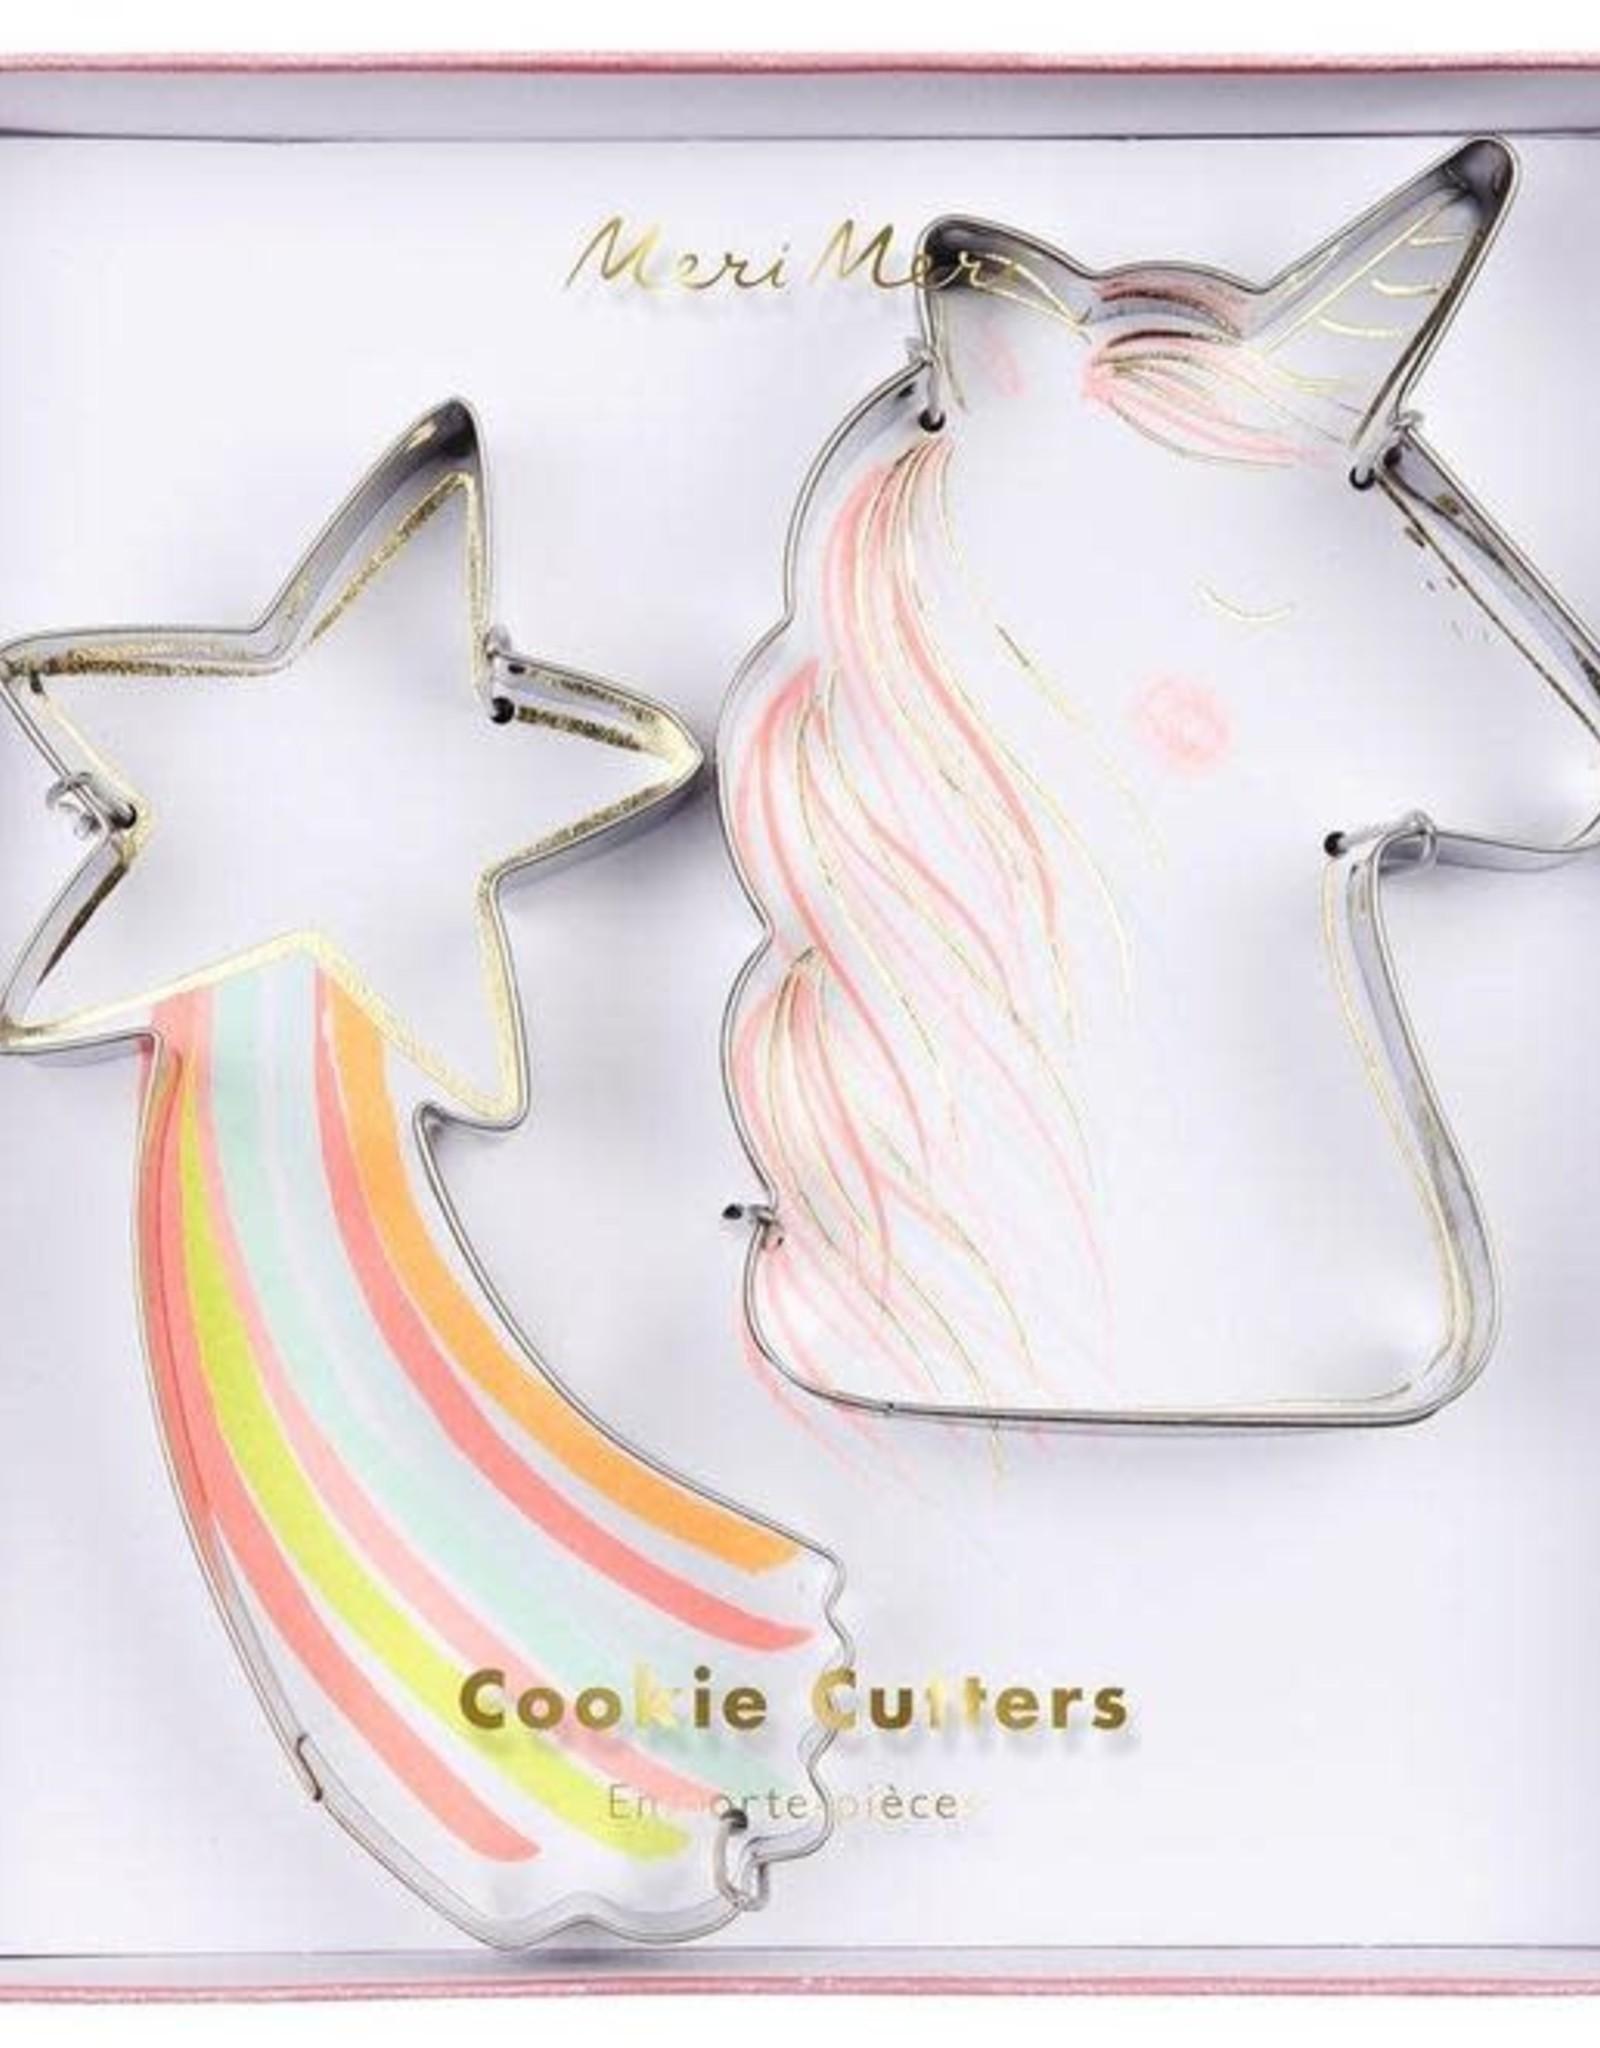 Meri Meri Star and Unicorn Cookie Cutters Set